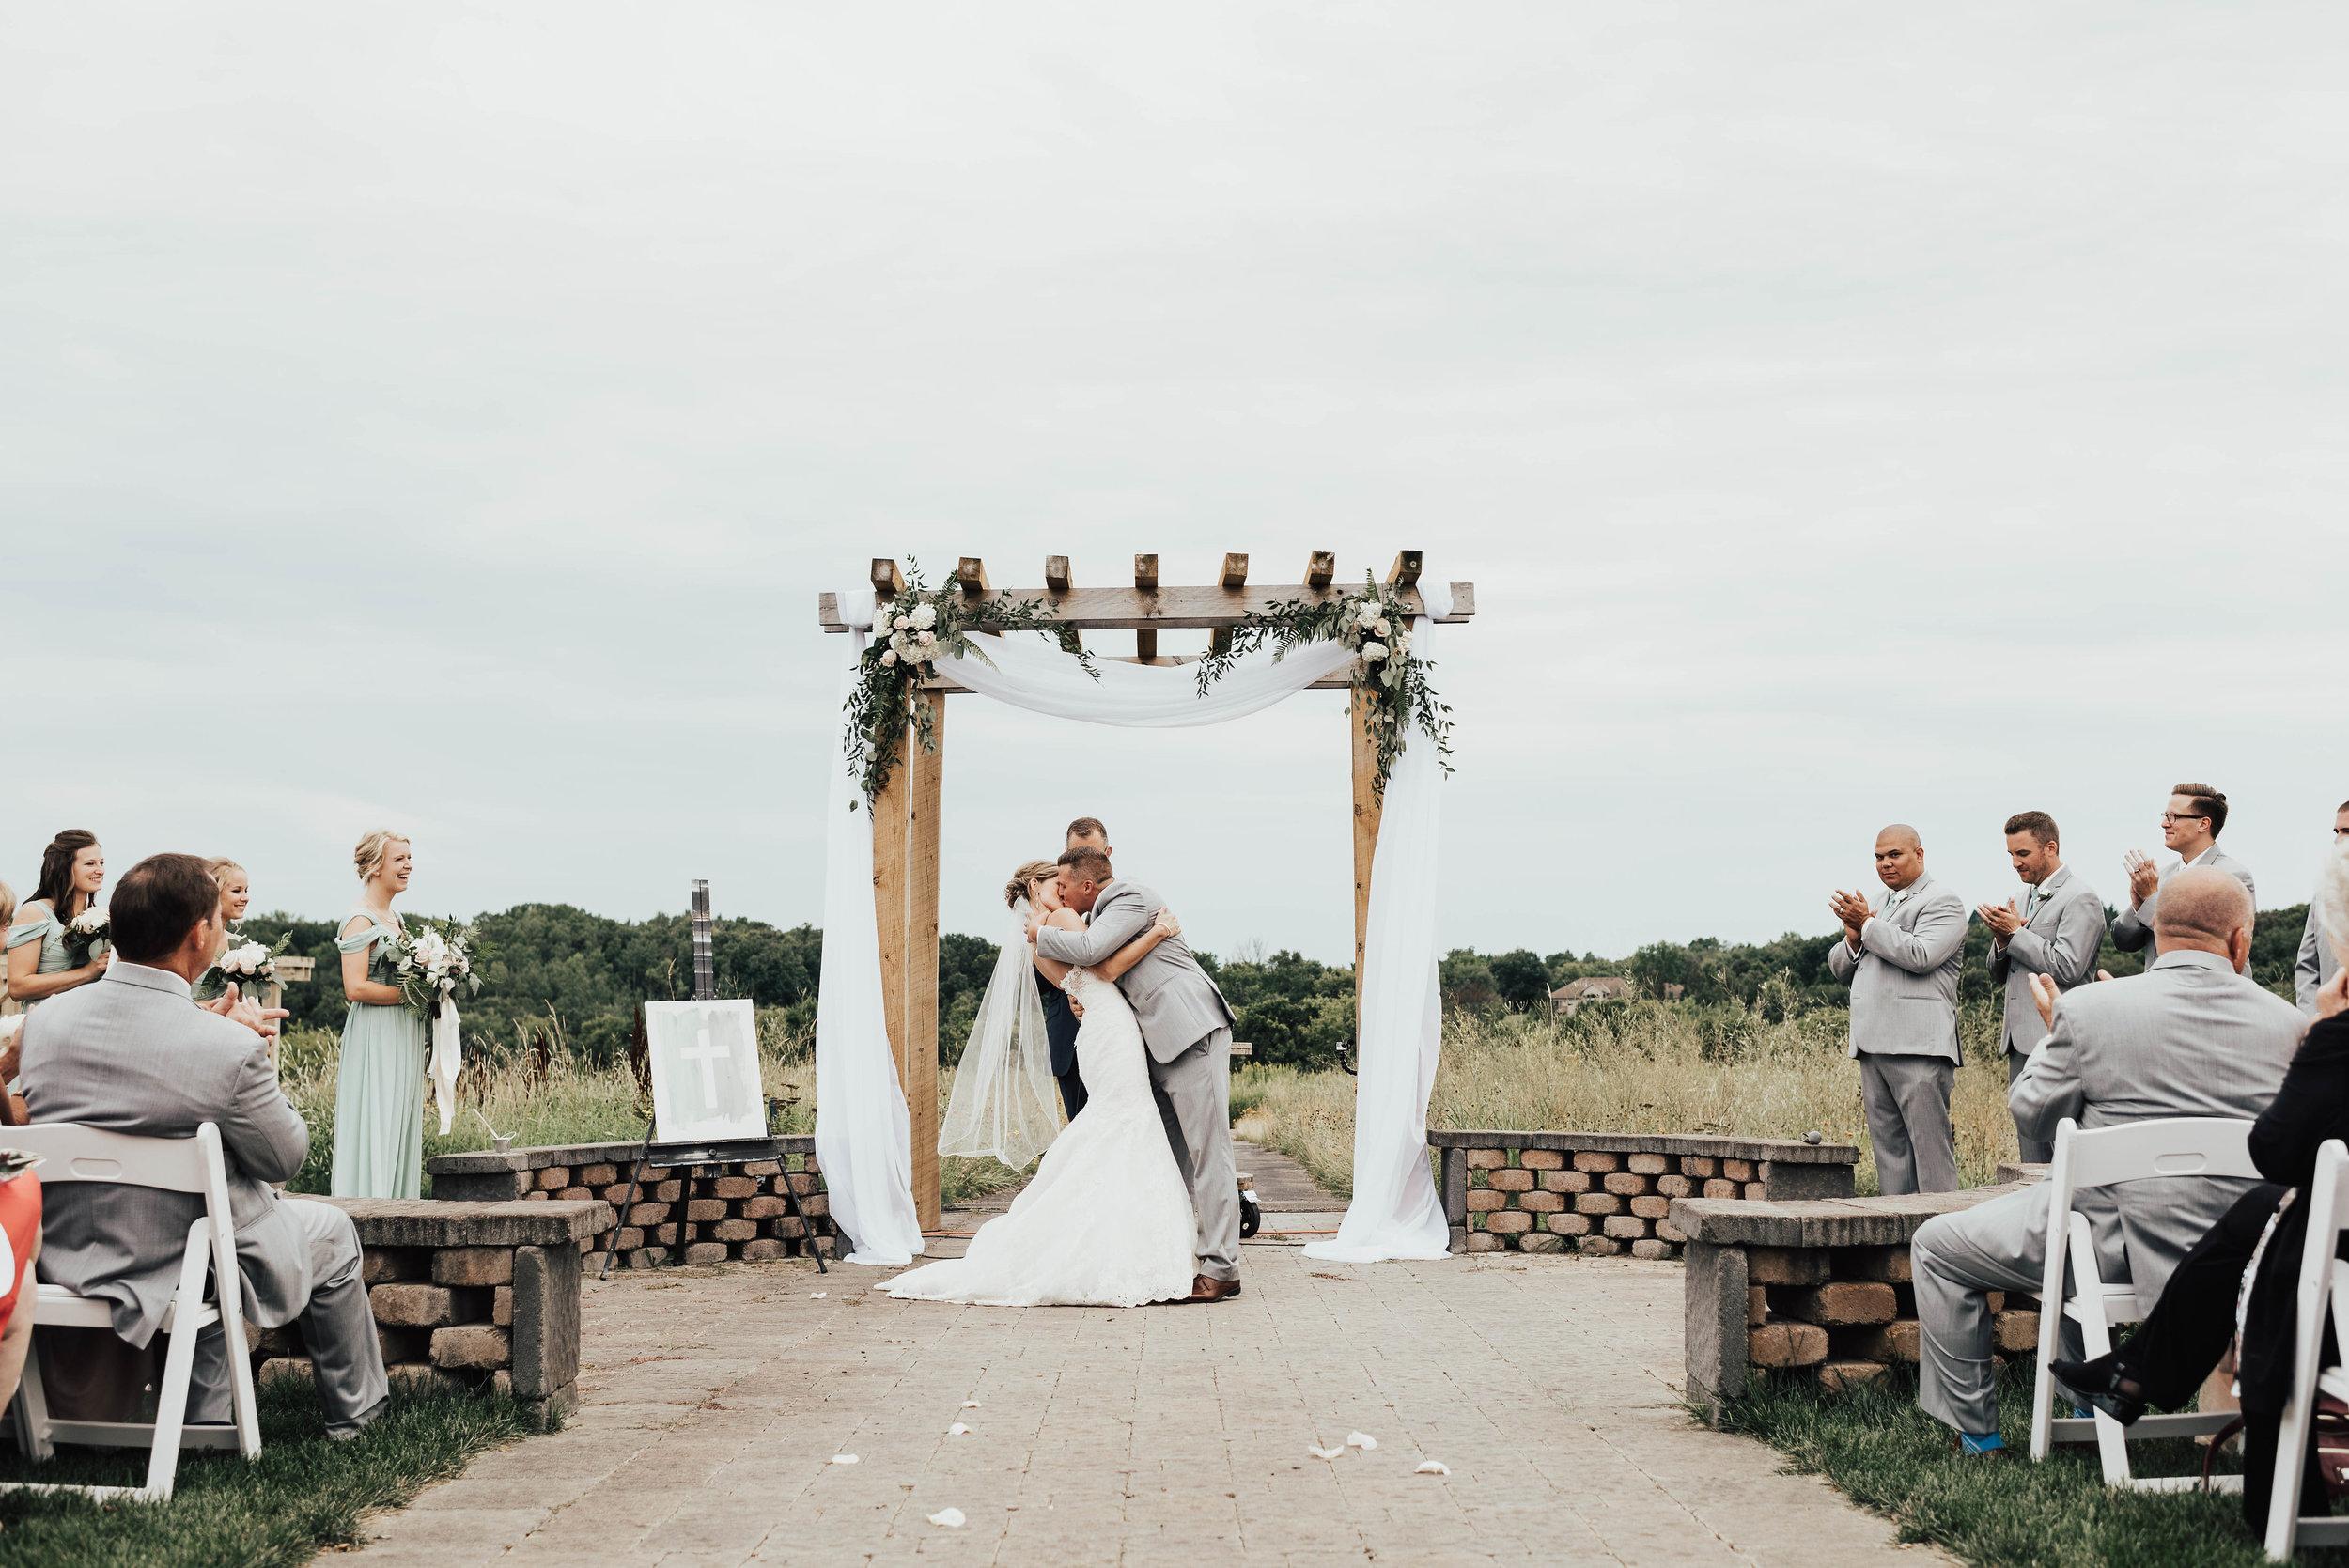 Outdoor wedding location in Minnesota